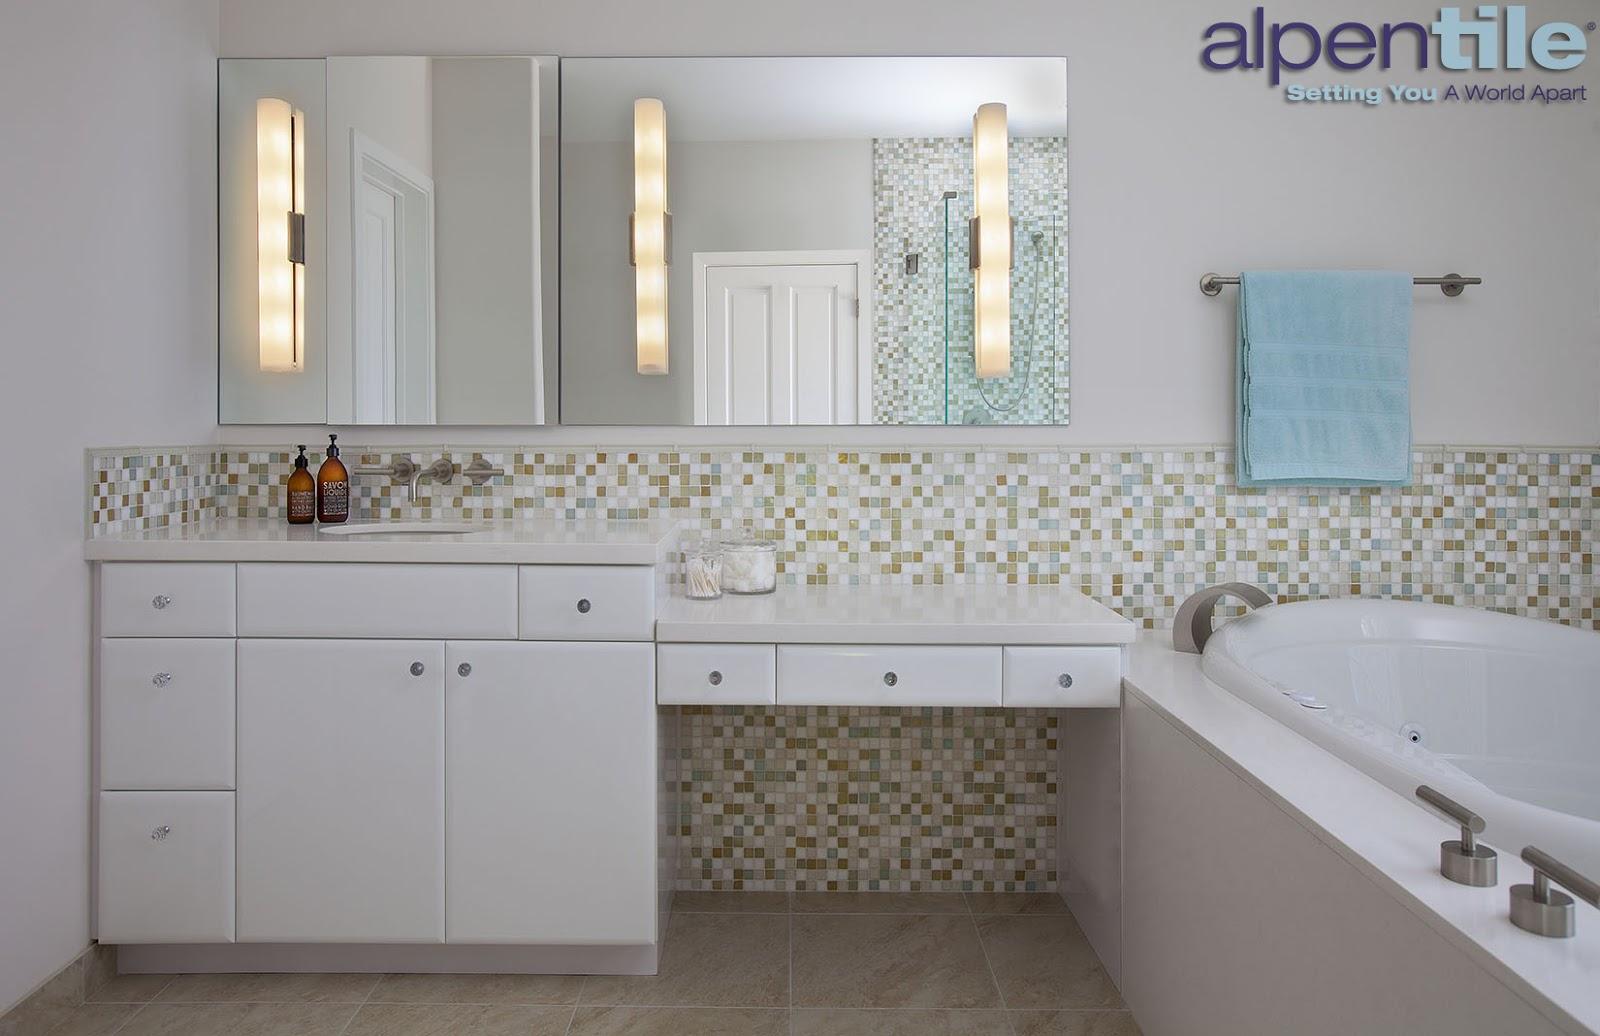 Alpentile Glass Tile Swimming Pools Contemporary Bright Bathroom